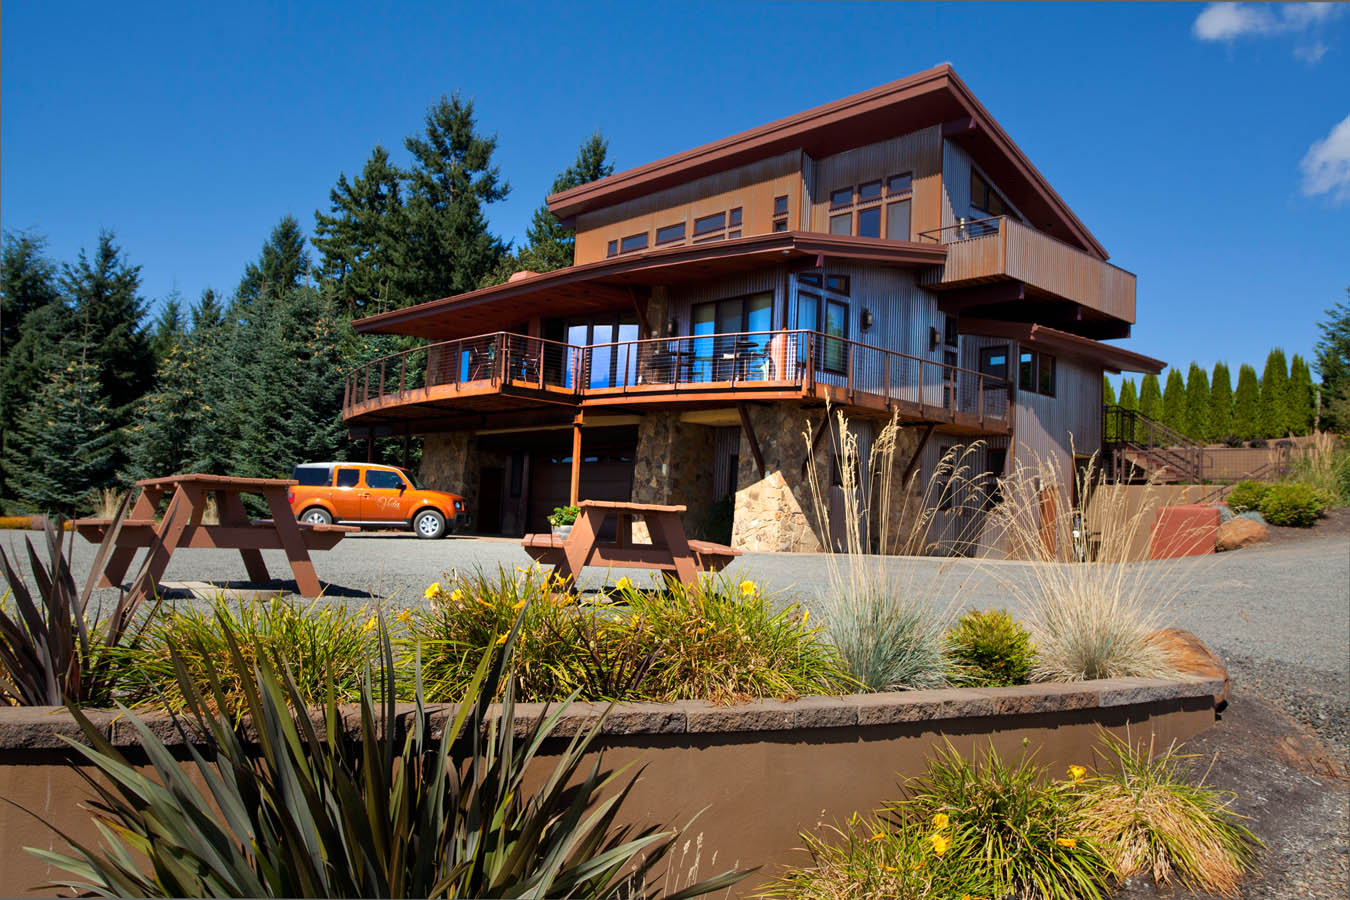 Northwest-Contemporary home in Portland